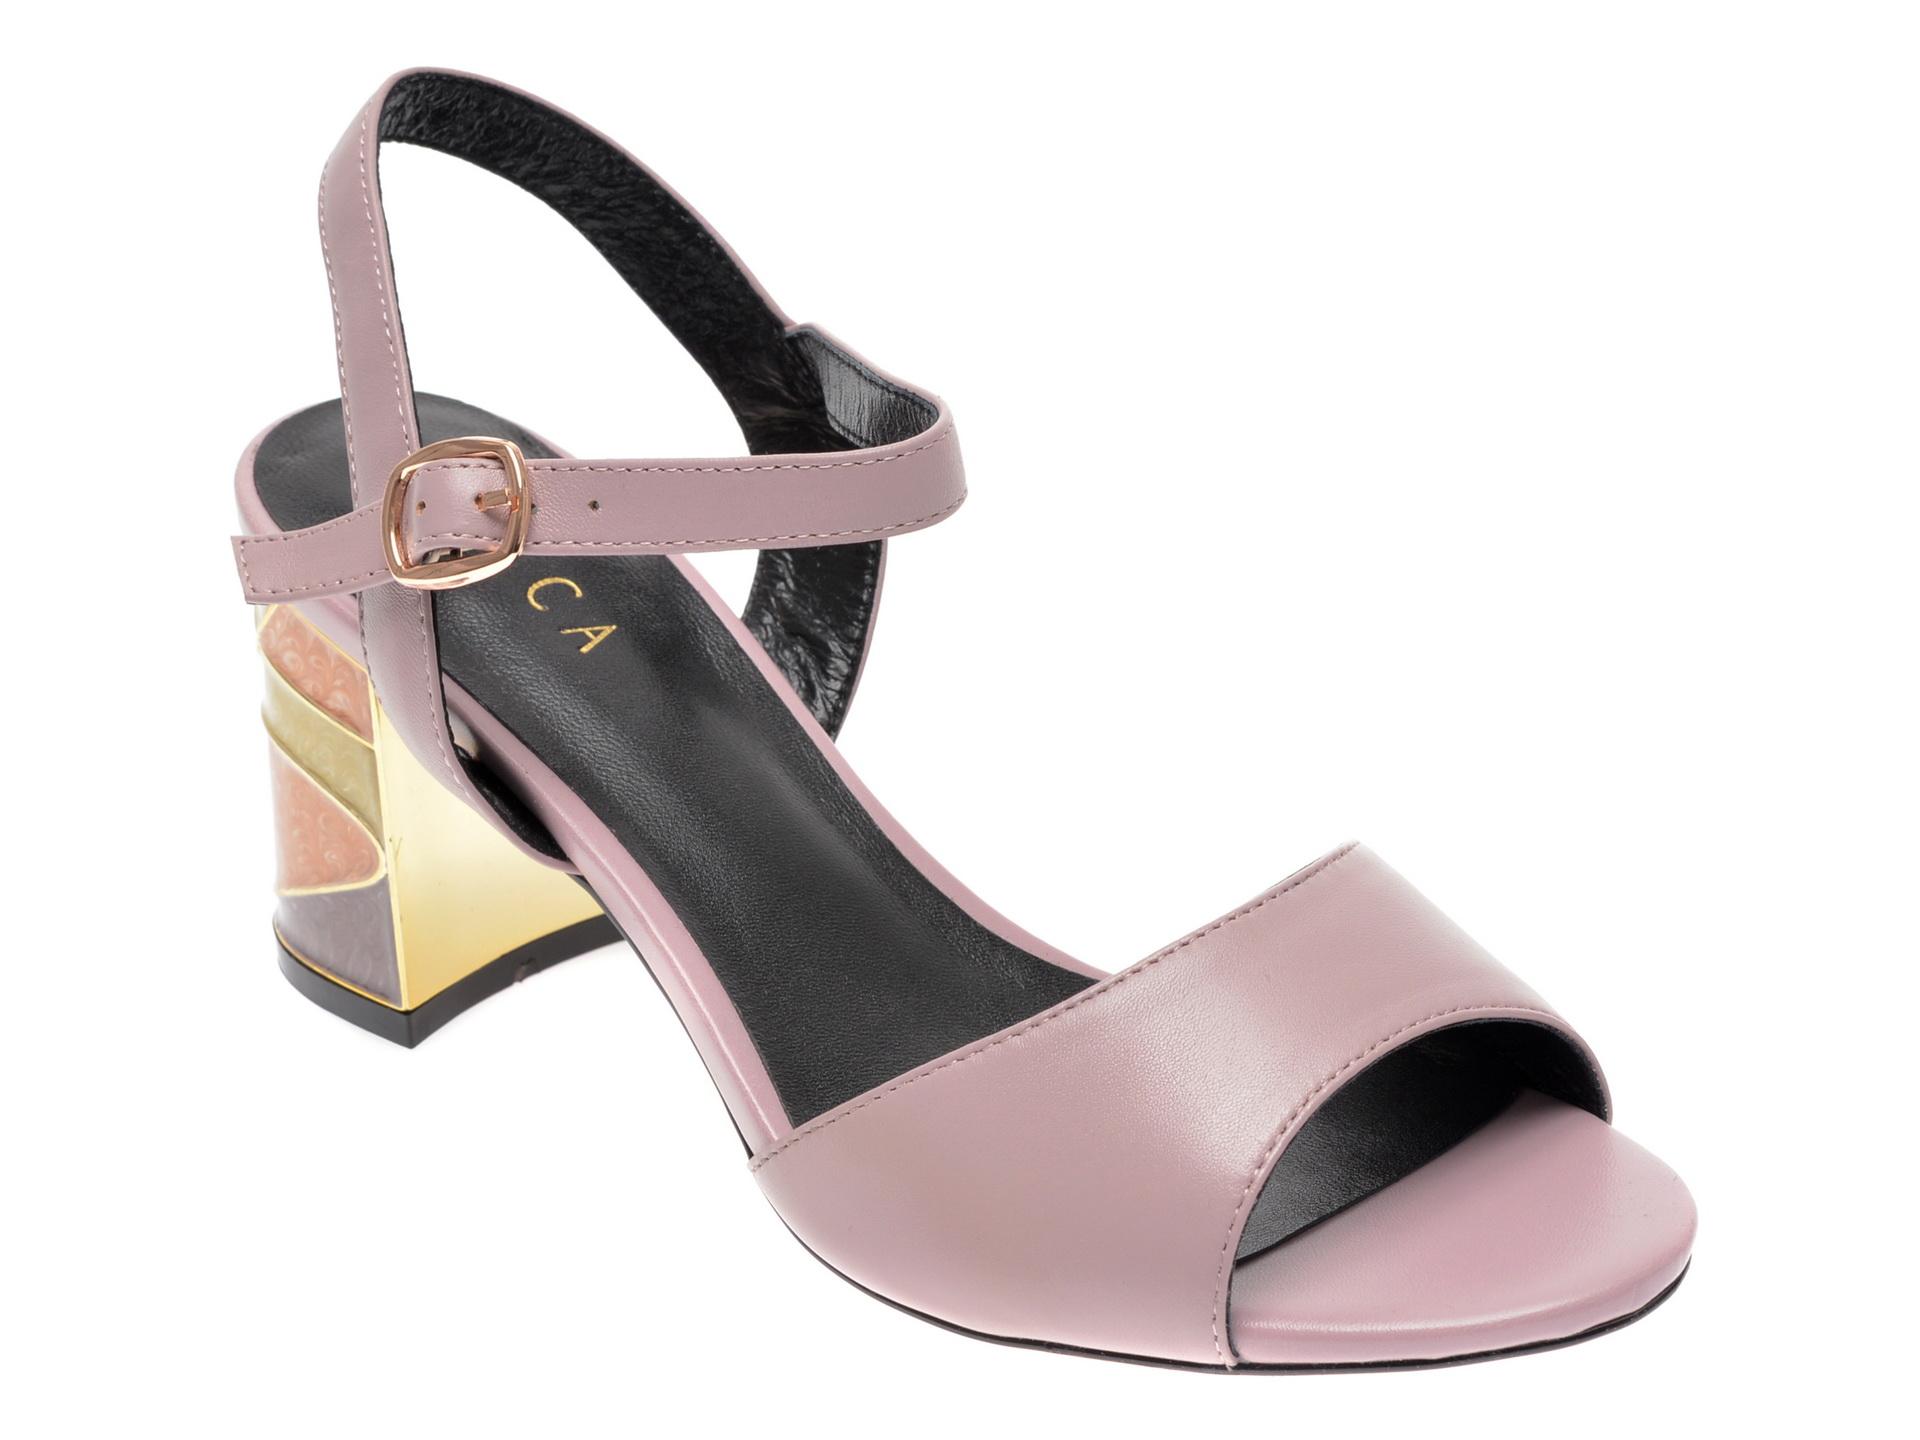 Sandale EPICA mov, 18J4260, din piele naturala imagine